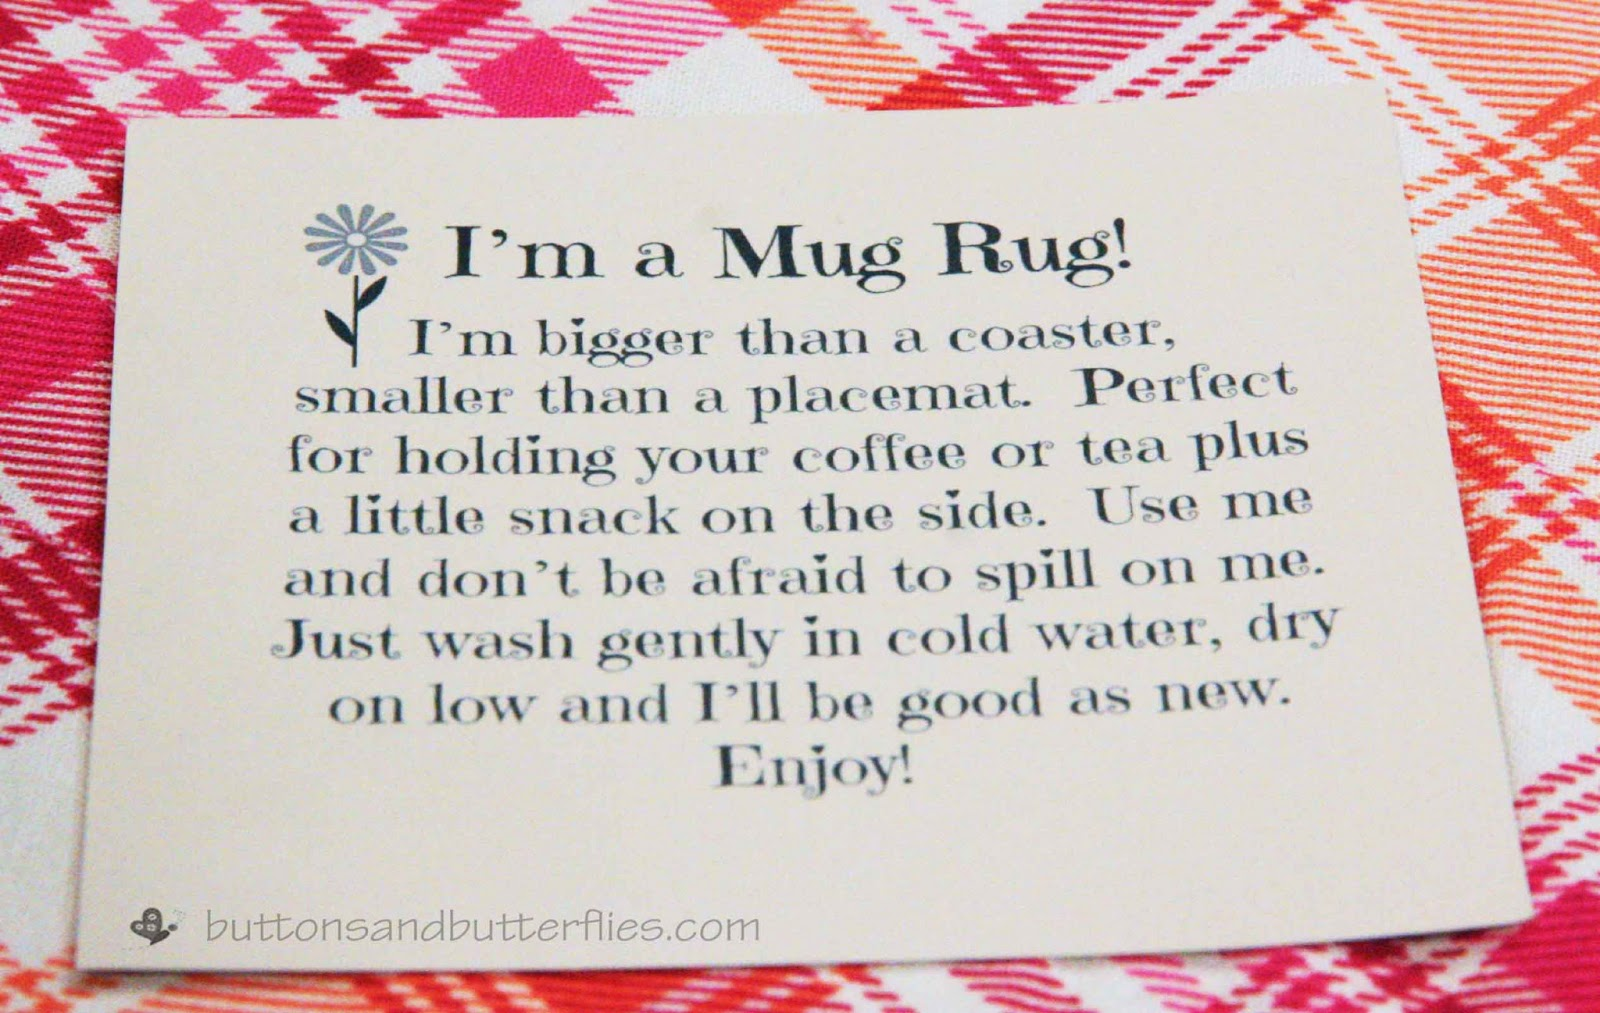 Buttons And Butterflies Mug Rug Tag